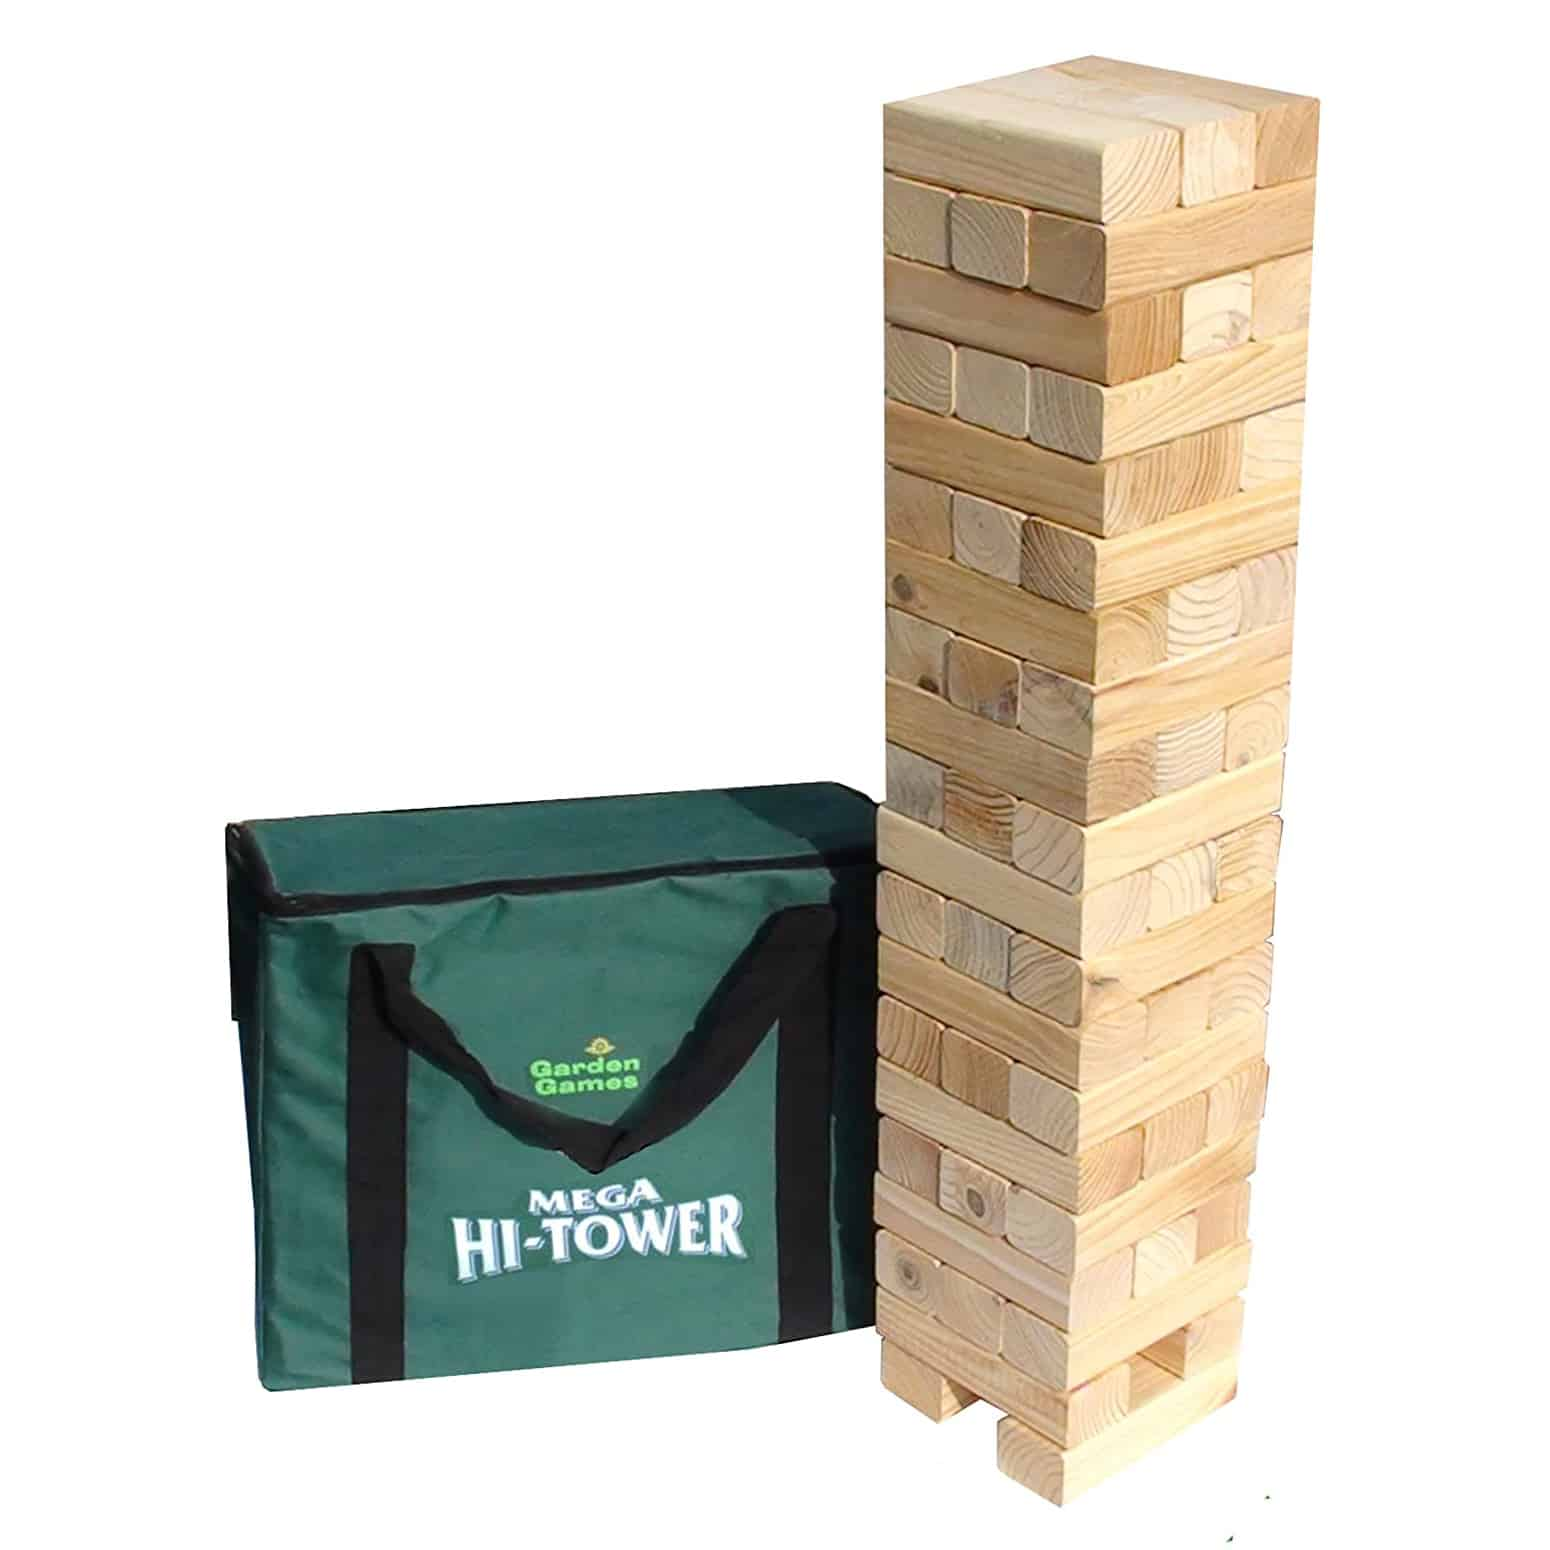 Mega Hi-Tower Tumbling Tower Game